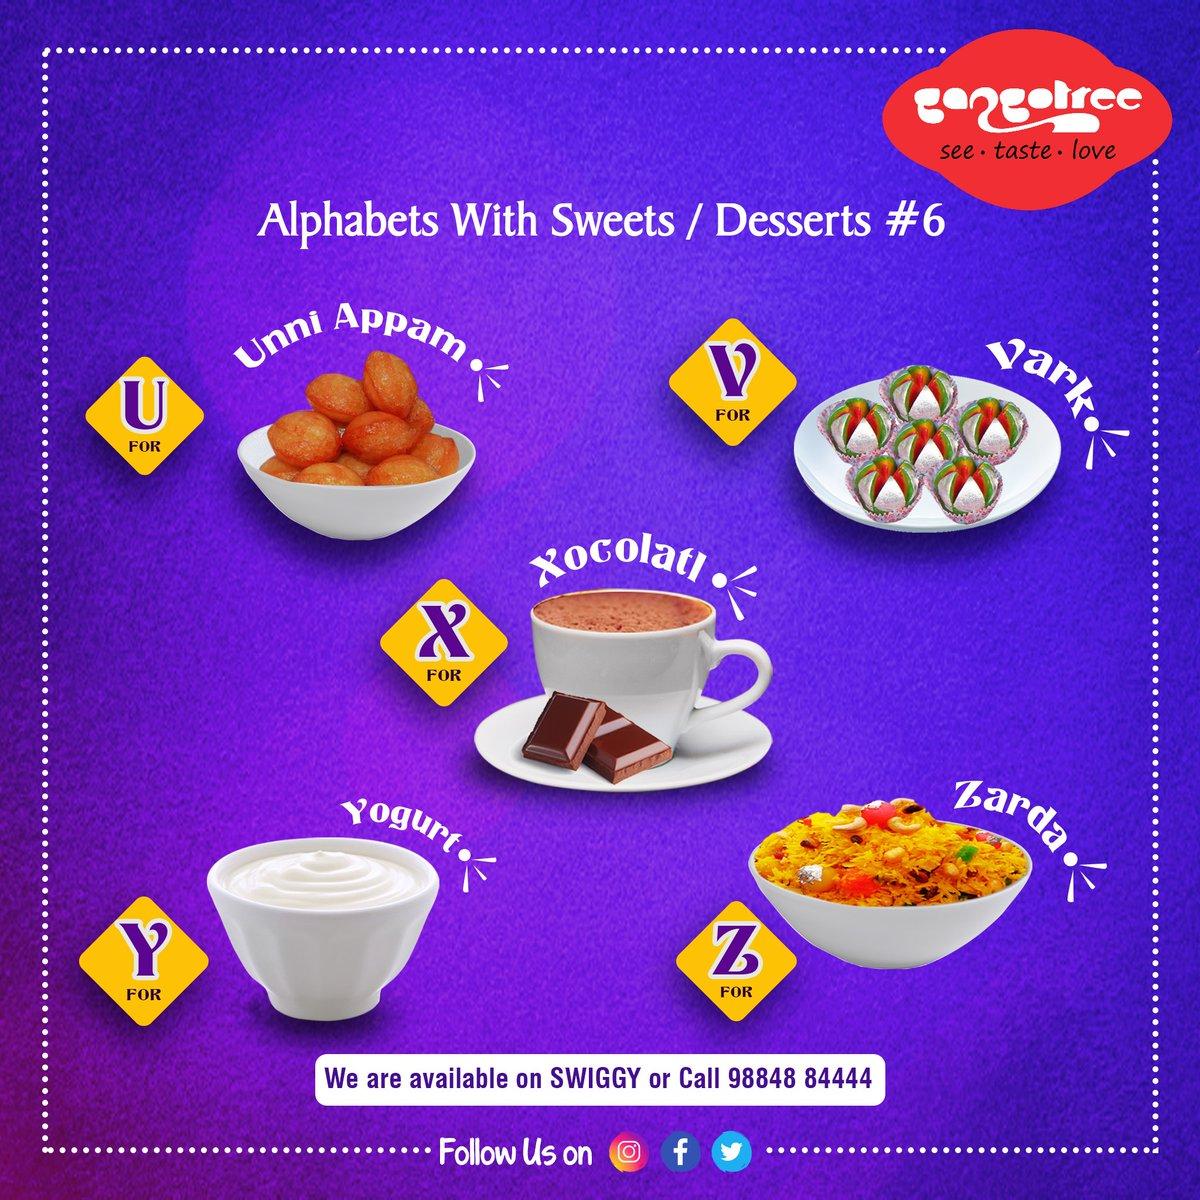 Part - 6 What You gonna choose from this list? @ Gangotree Sweets   #GangotreeSweets #desserts #indiansweets #chennaibloggers #chennaiexpress #chennaifoodie #yummy #soChennai #WhereChennaiEats #indiansnacks #foodtalkindia #eeeeeats #foodstagram #indiandesserts #eveningsnackspic.twitter.com/rl0f8SvDri